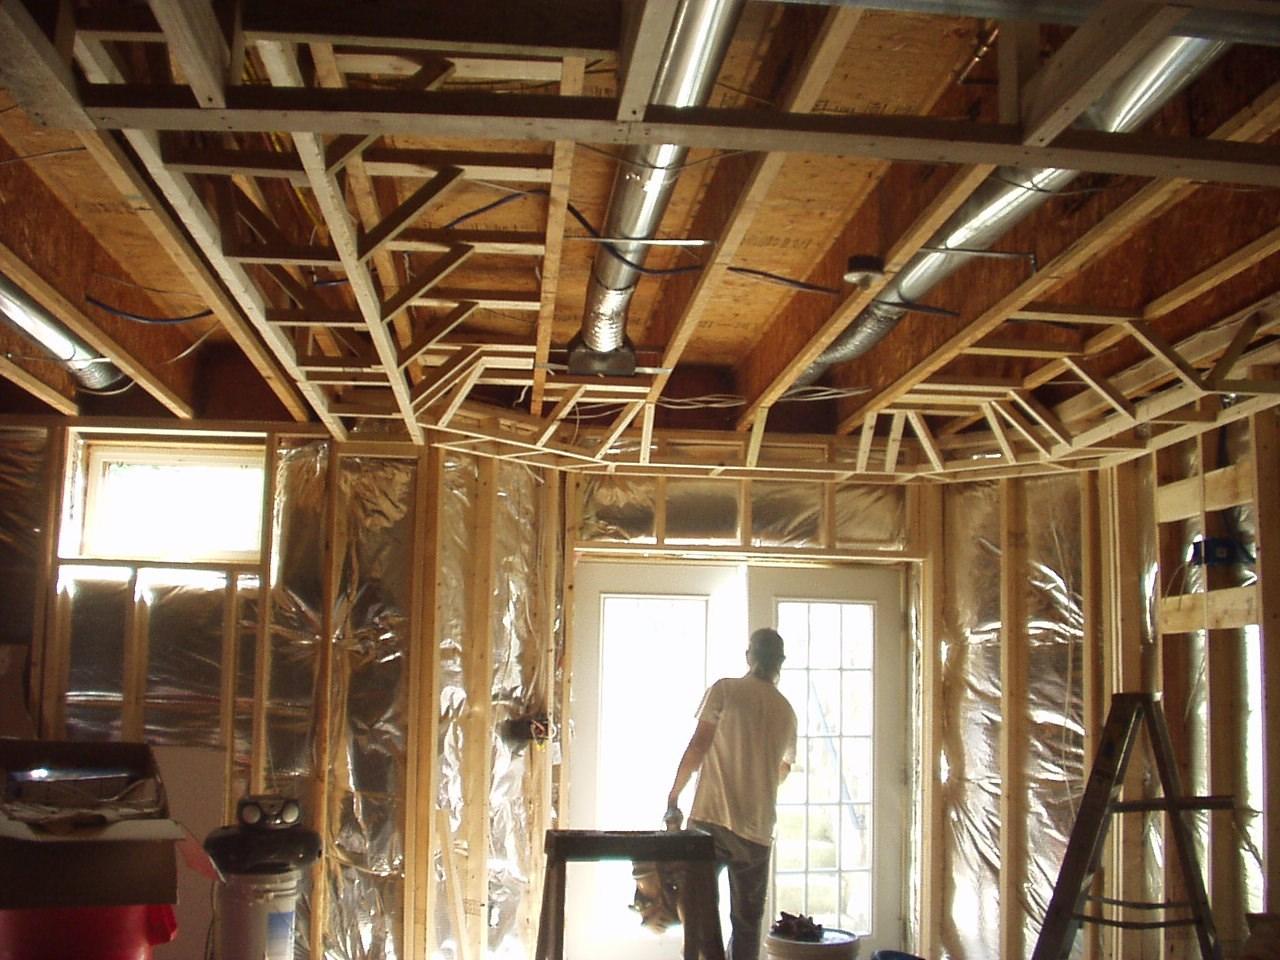 Hcc Remodeling Gainesville Va 20155 Angies List